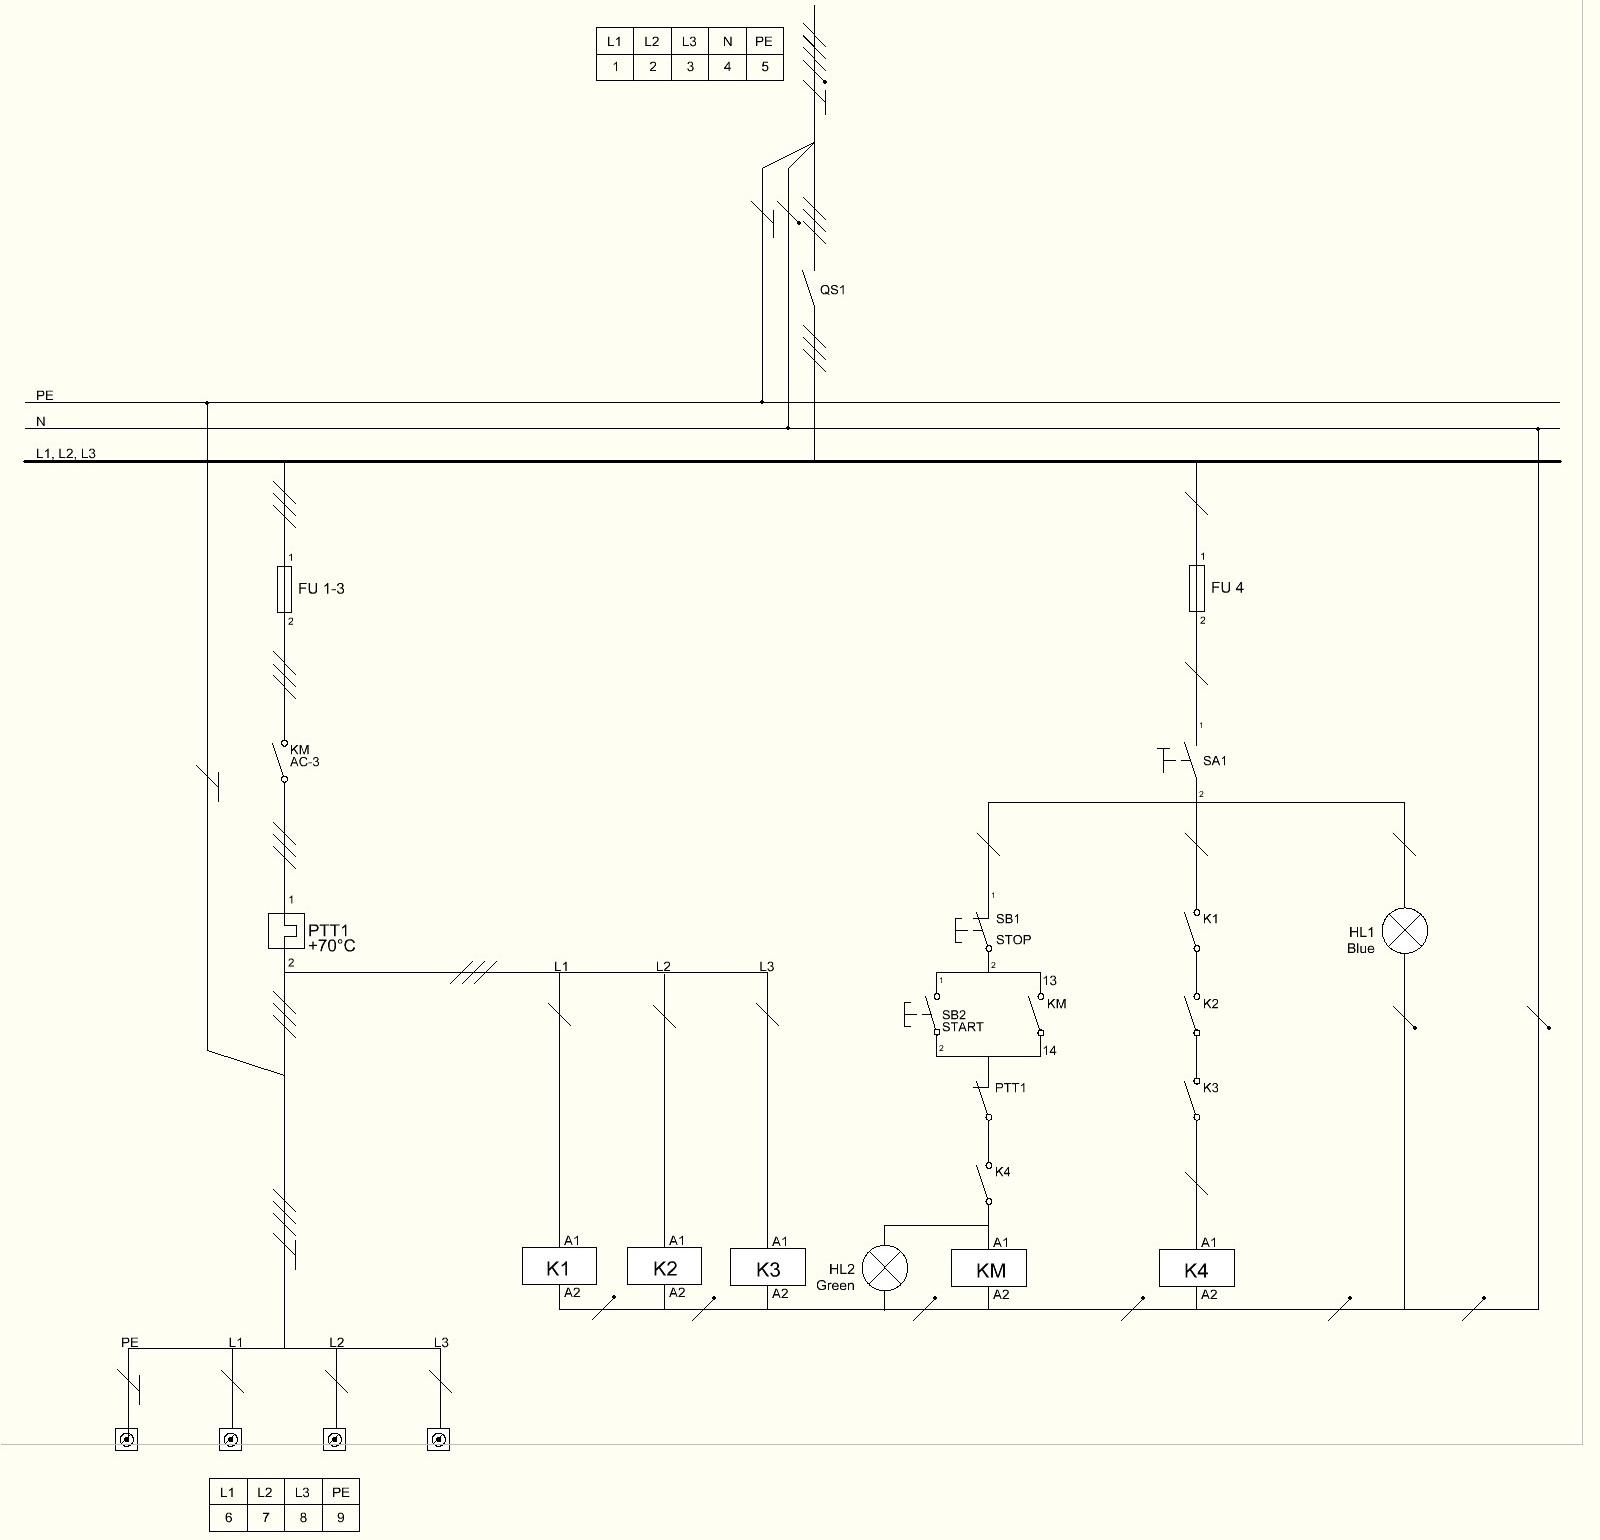 century electric motor wiring diagram download at